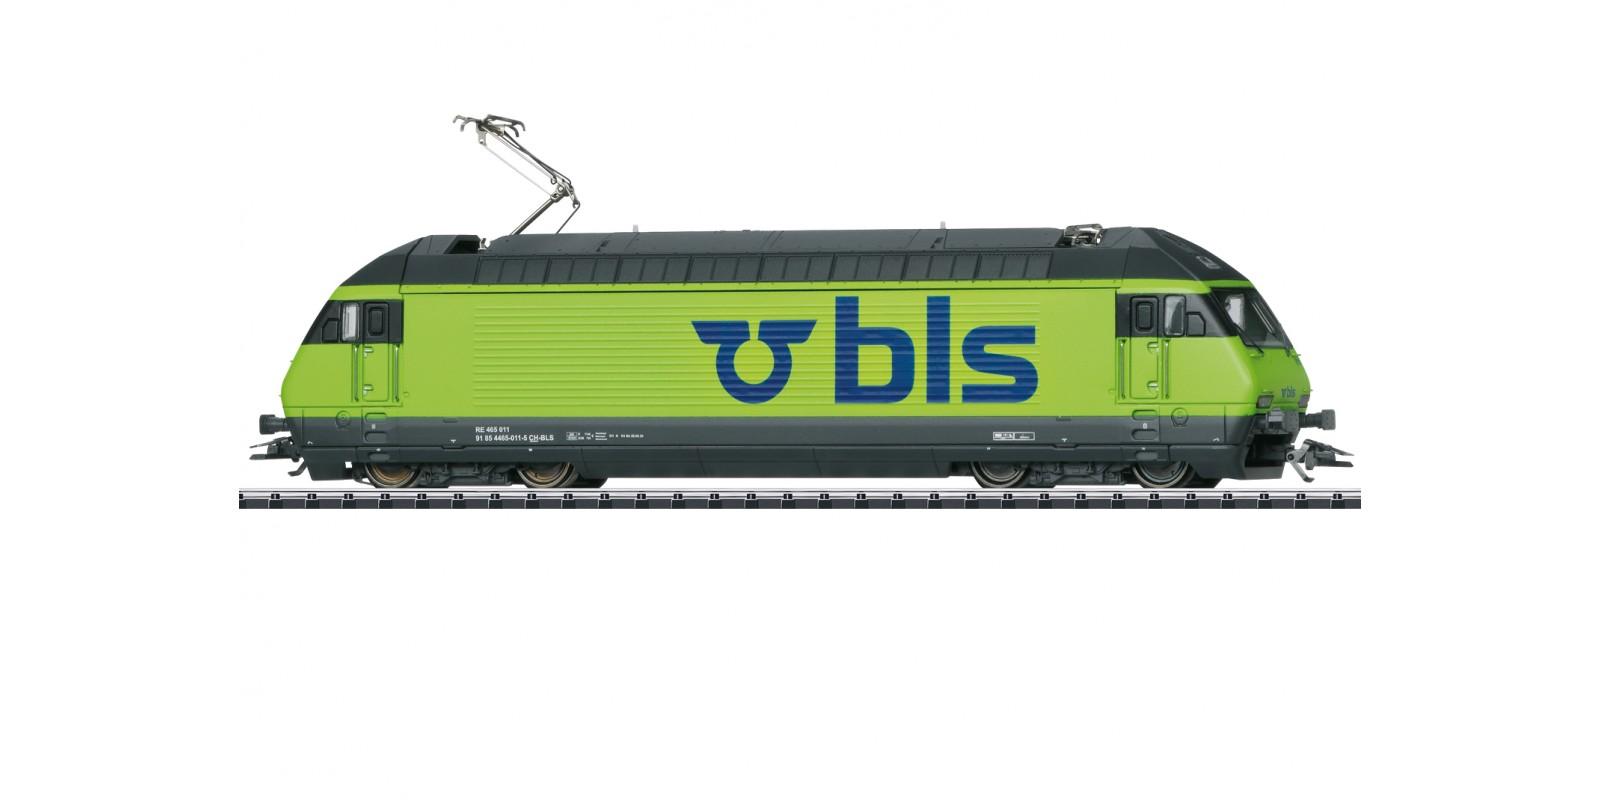 T22830 Class 465 Electric Locomotive